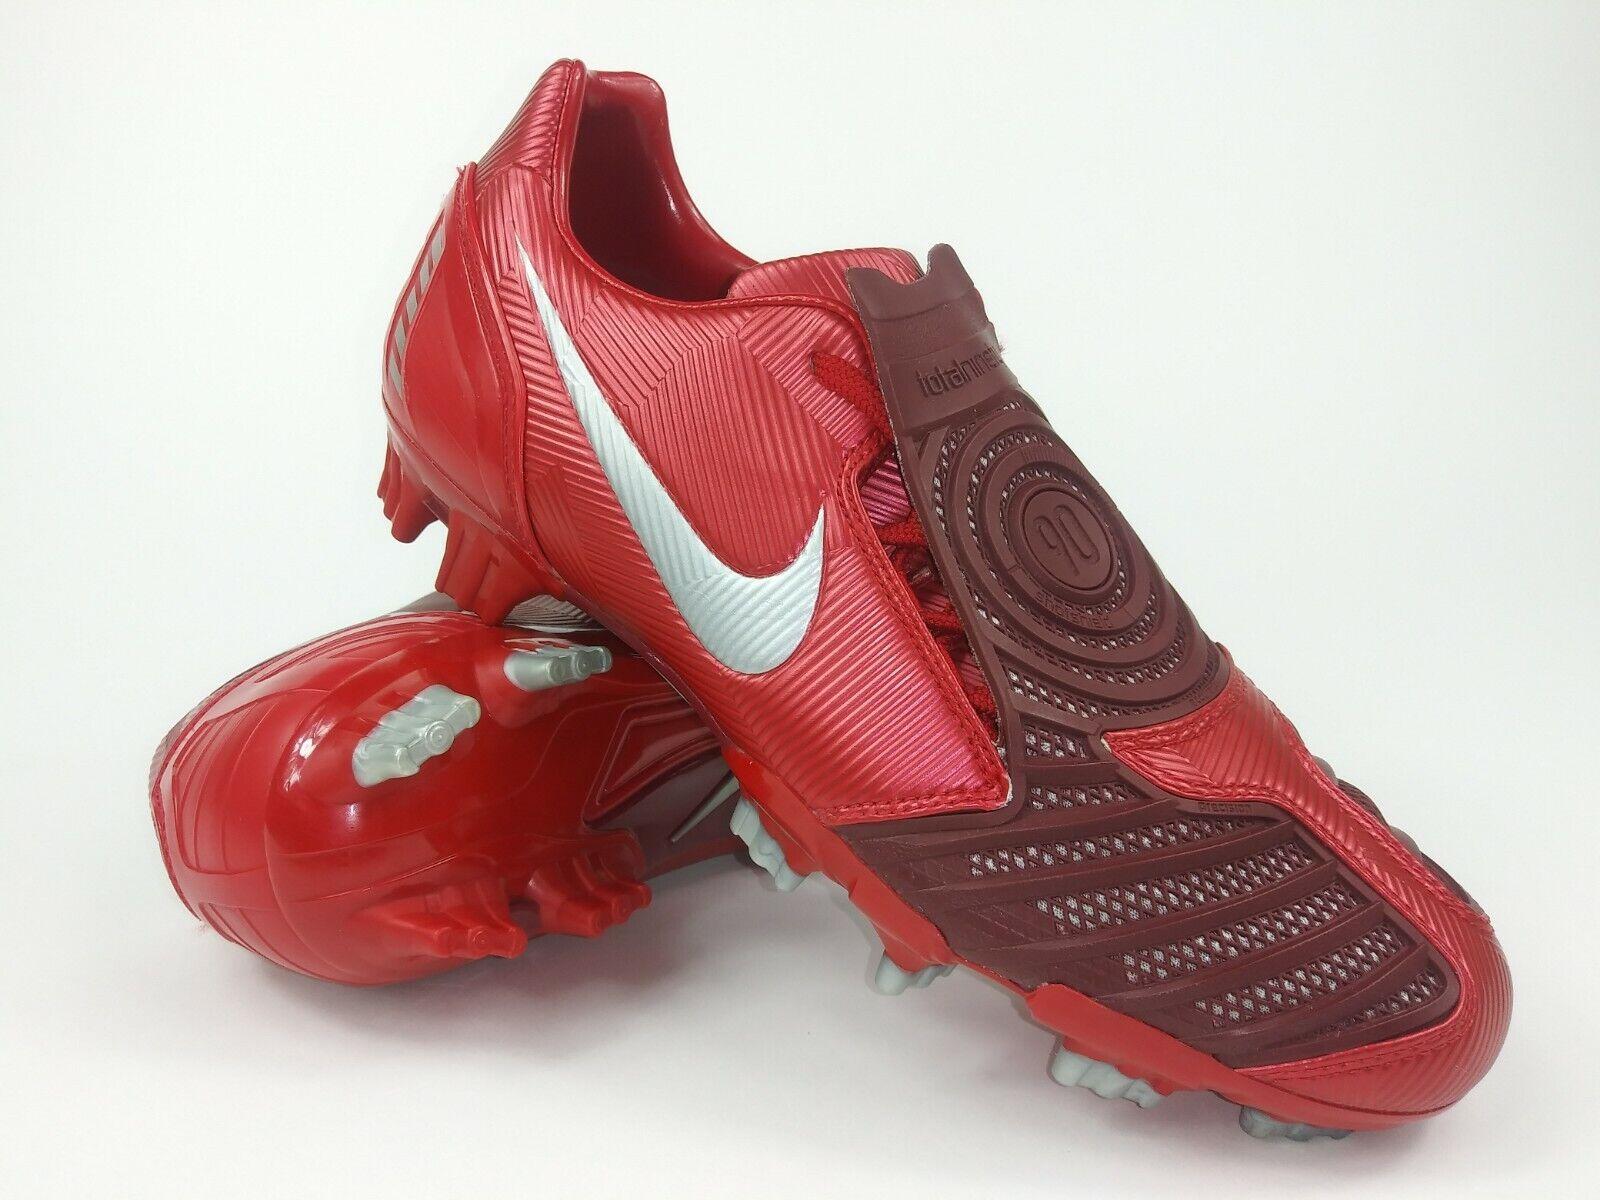 Nike Hombre Raro Total90 Huelga II Fg Fútbol Tacos 318792-606 Rojo Talla US 10.5